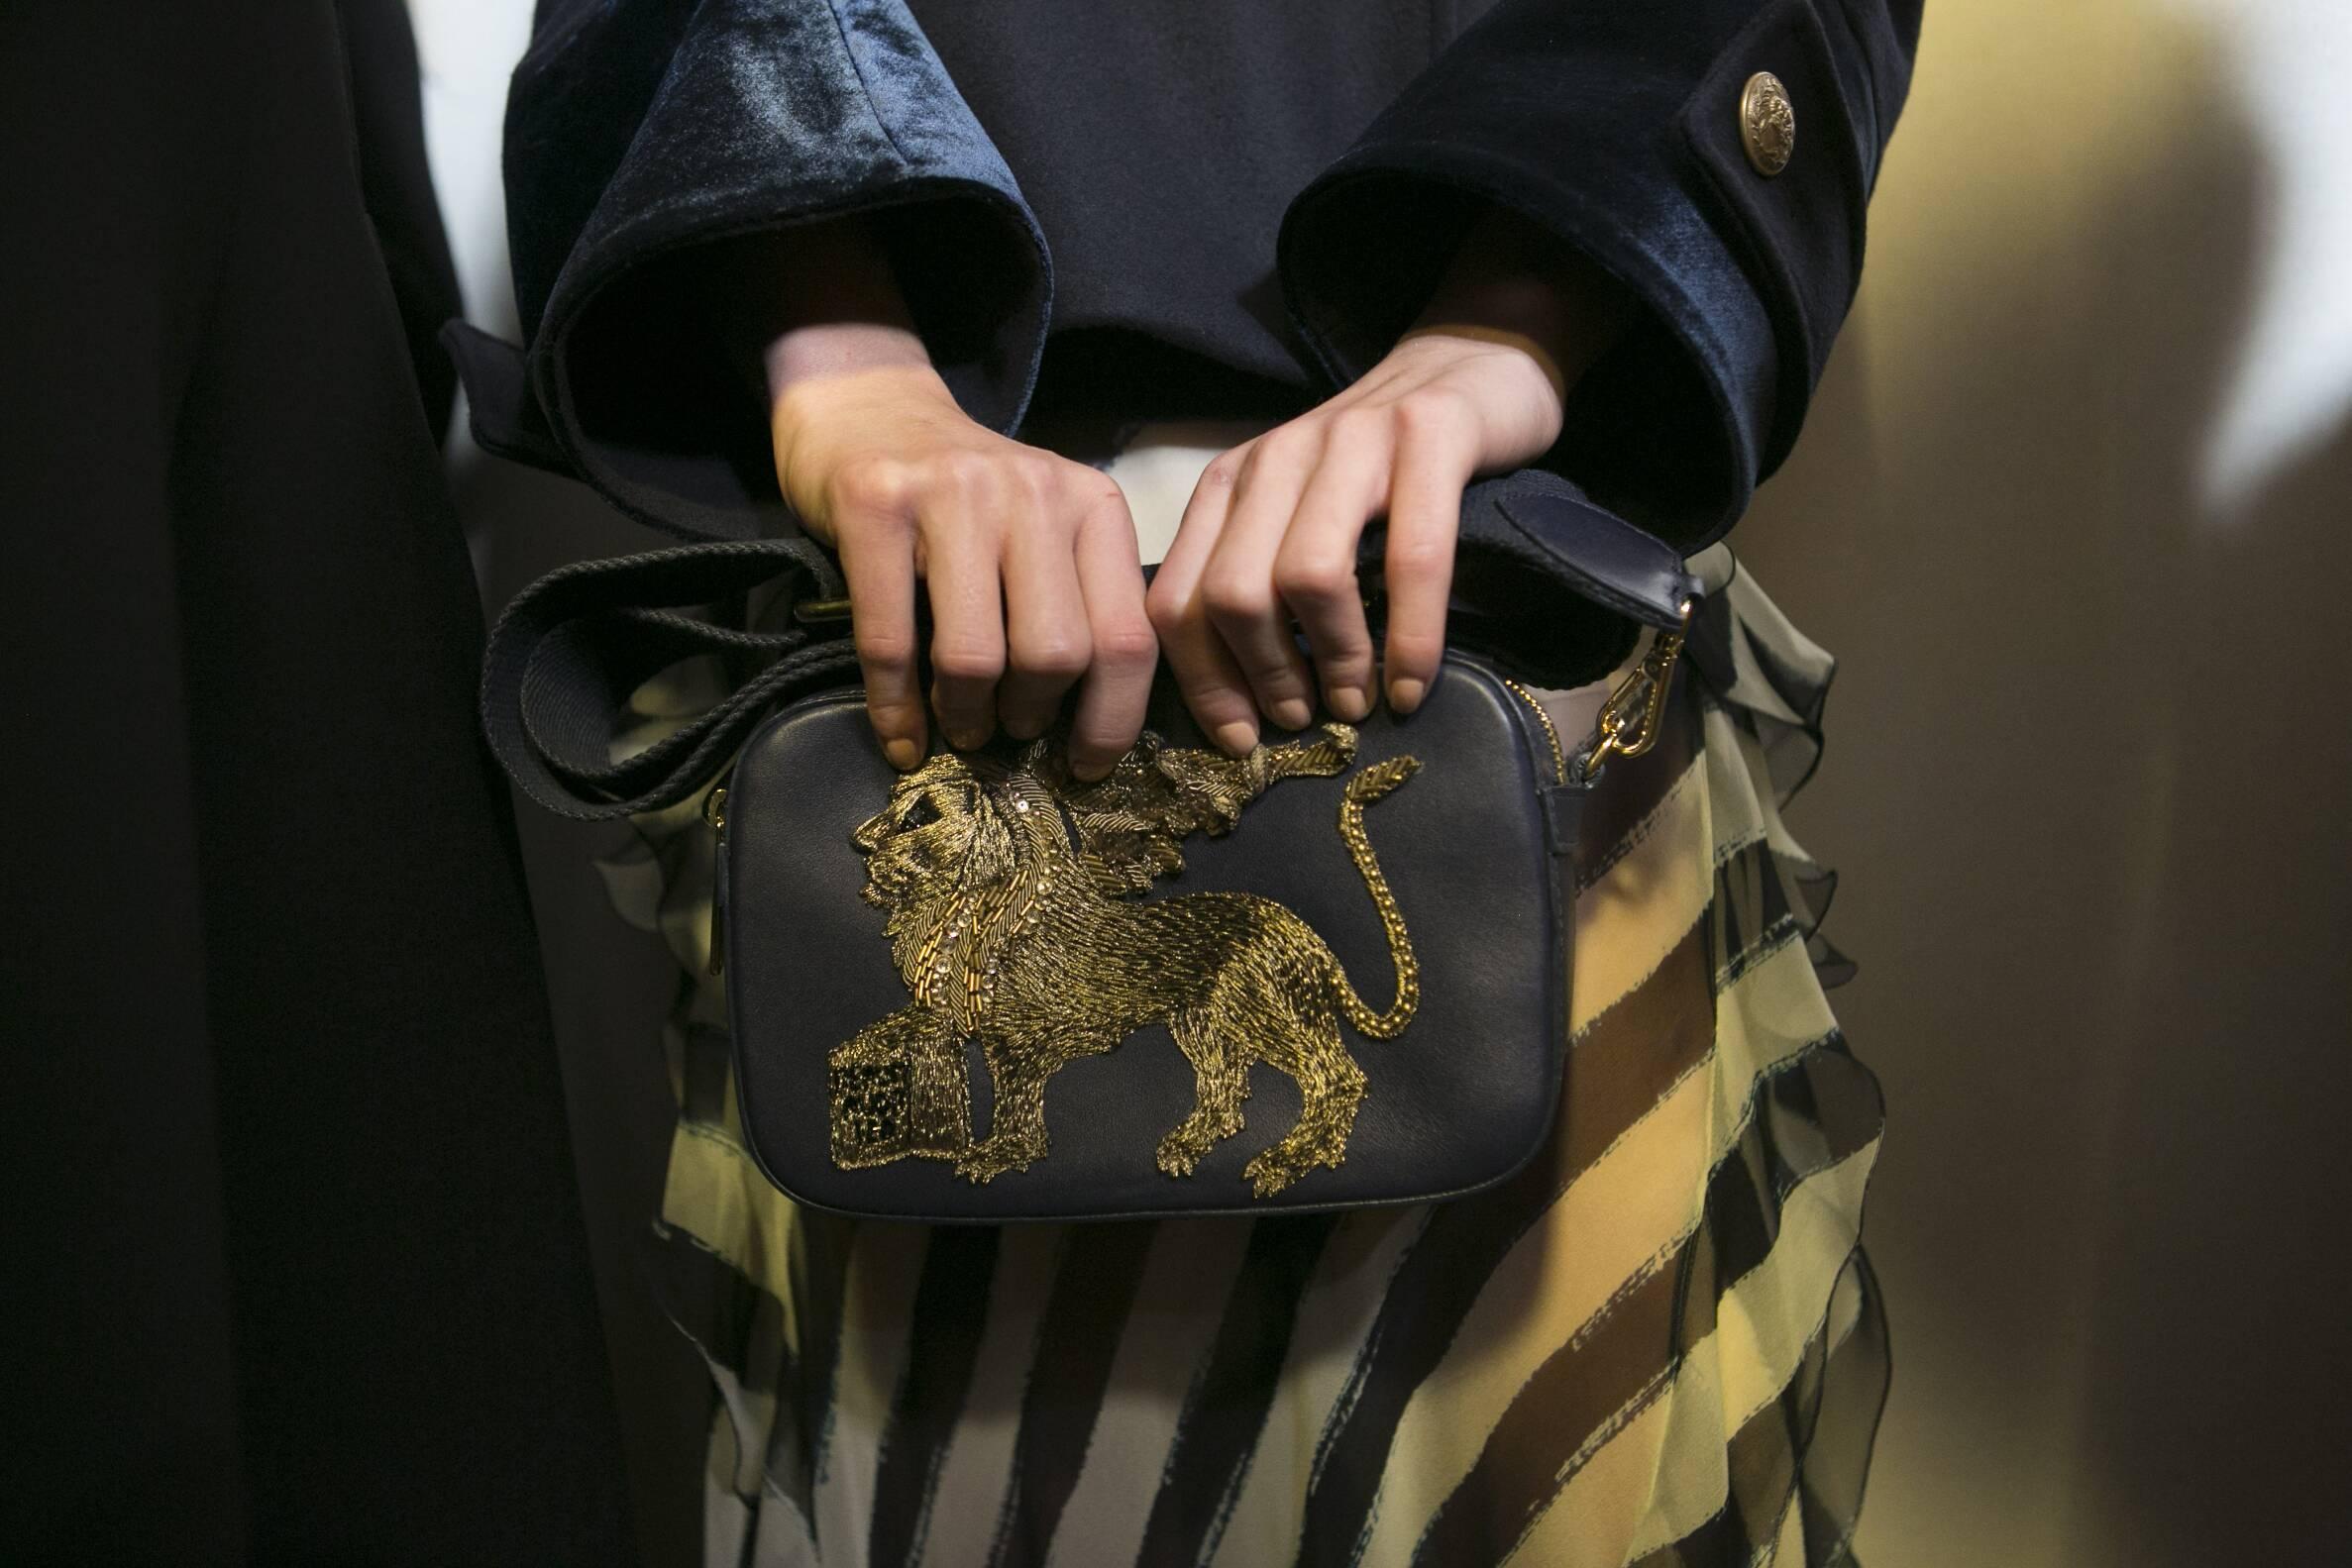 Backstage Alberta Ferretti Bag Detail 2017 Fall Winter 2017 Collection